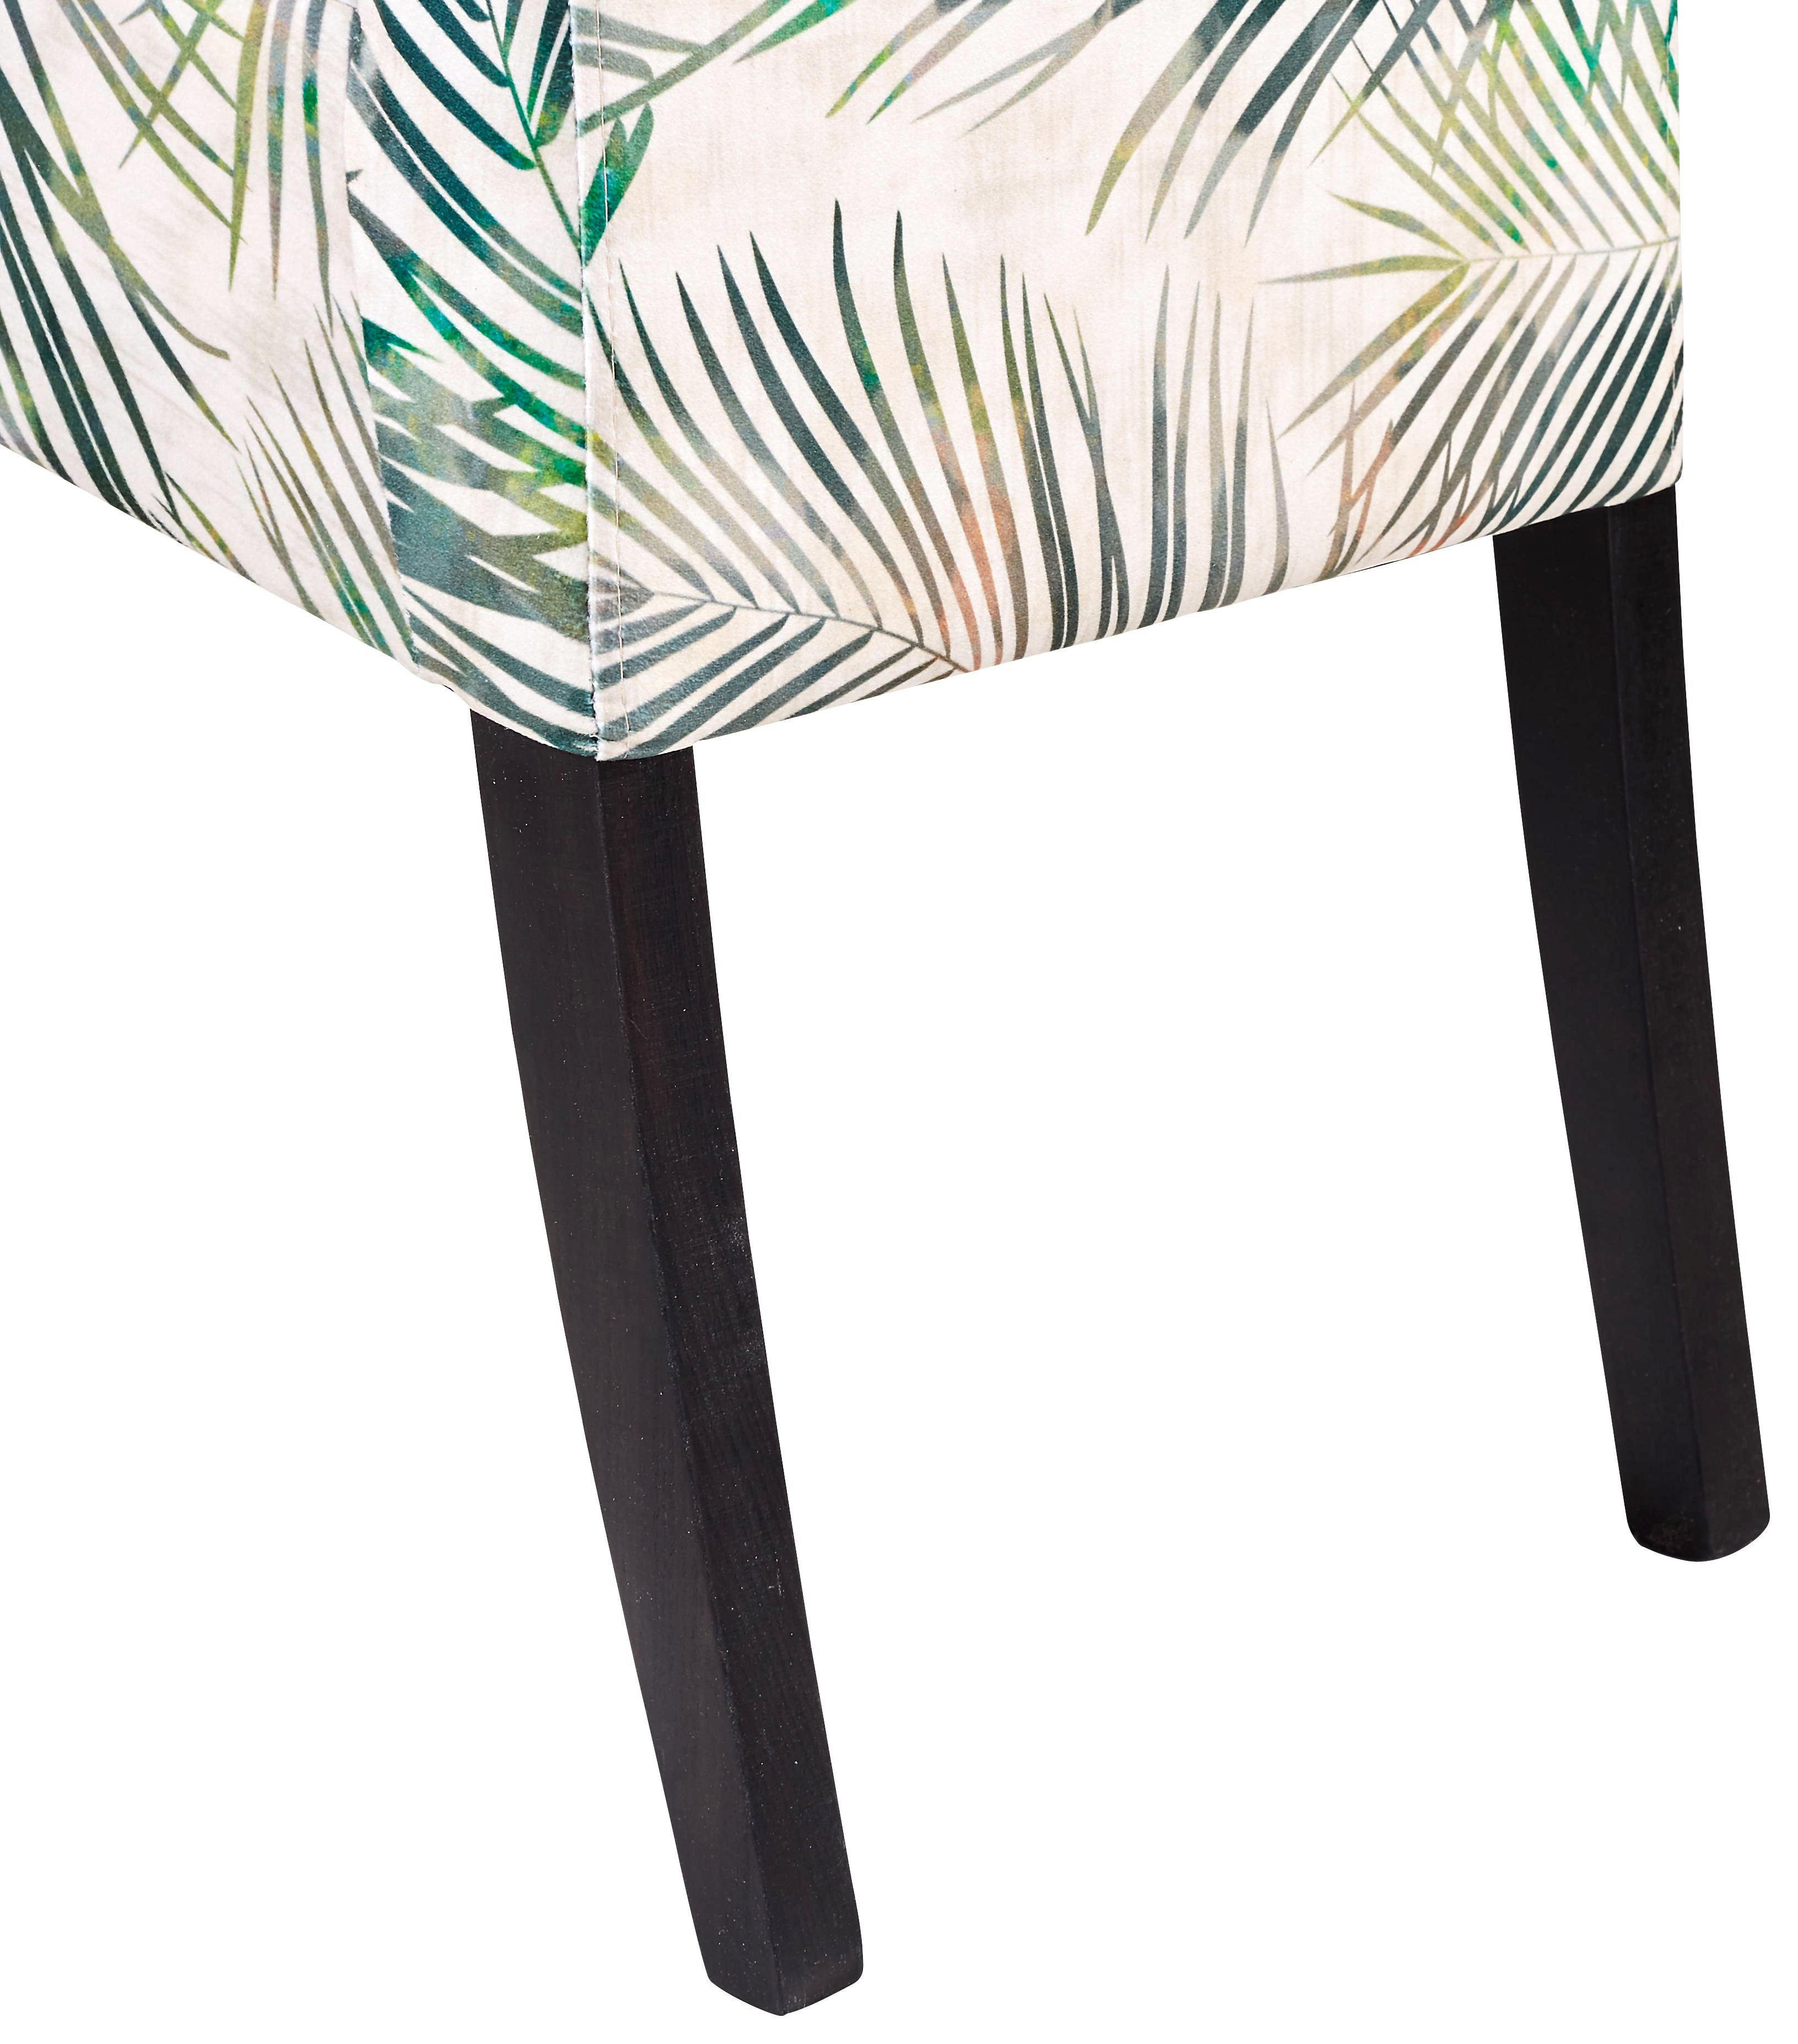 sthle gnstig auf rechnung elegant with sthle gnstig auf. Black Bedroom Furniture Sets. Home Design Ideas